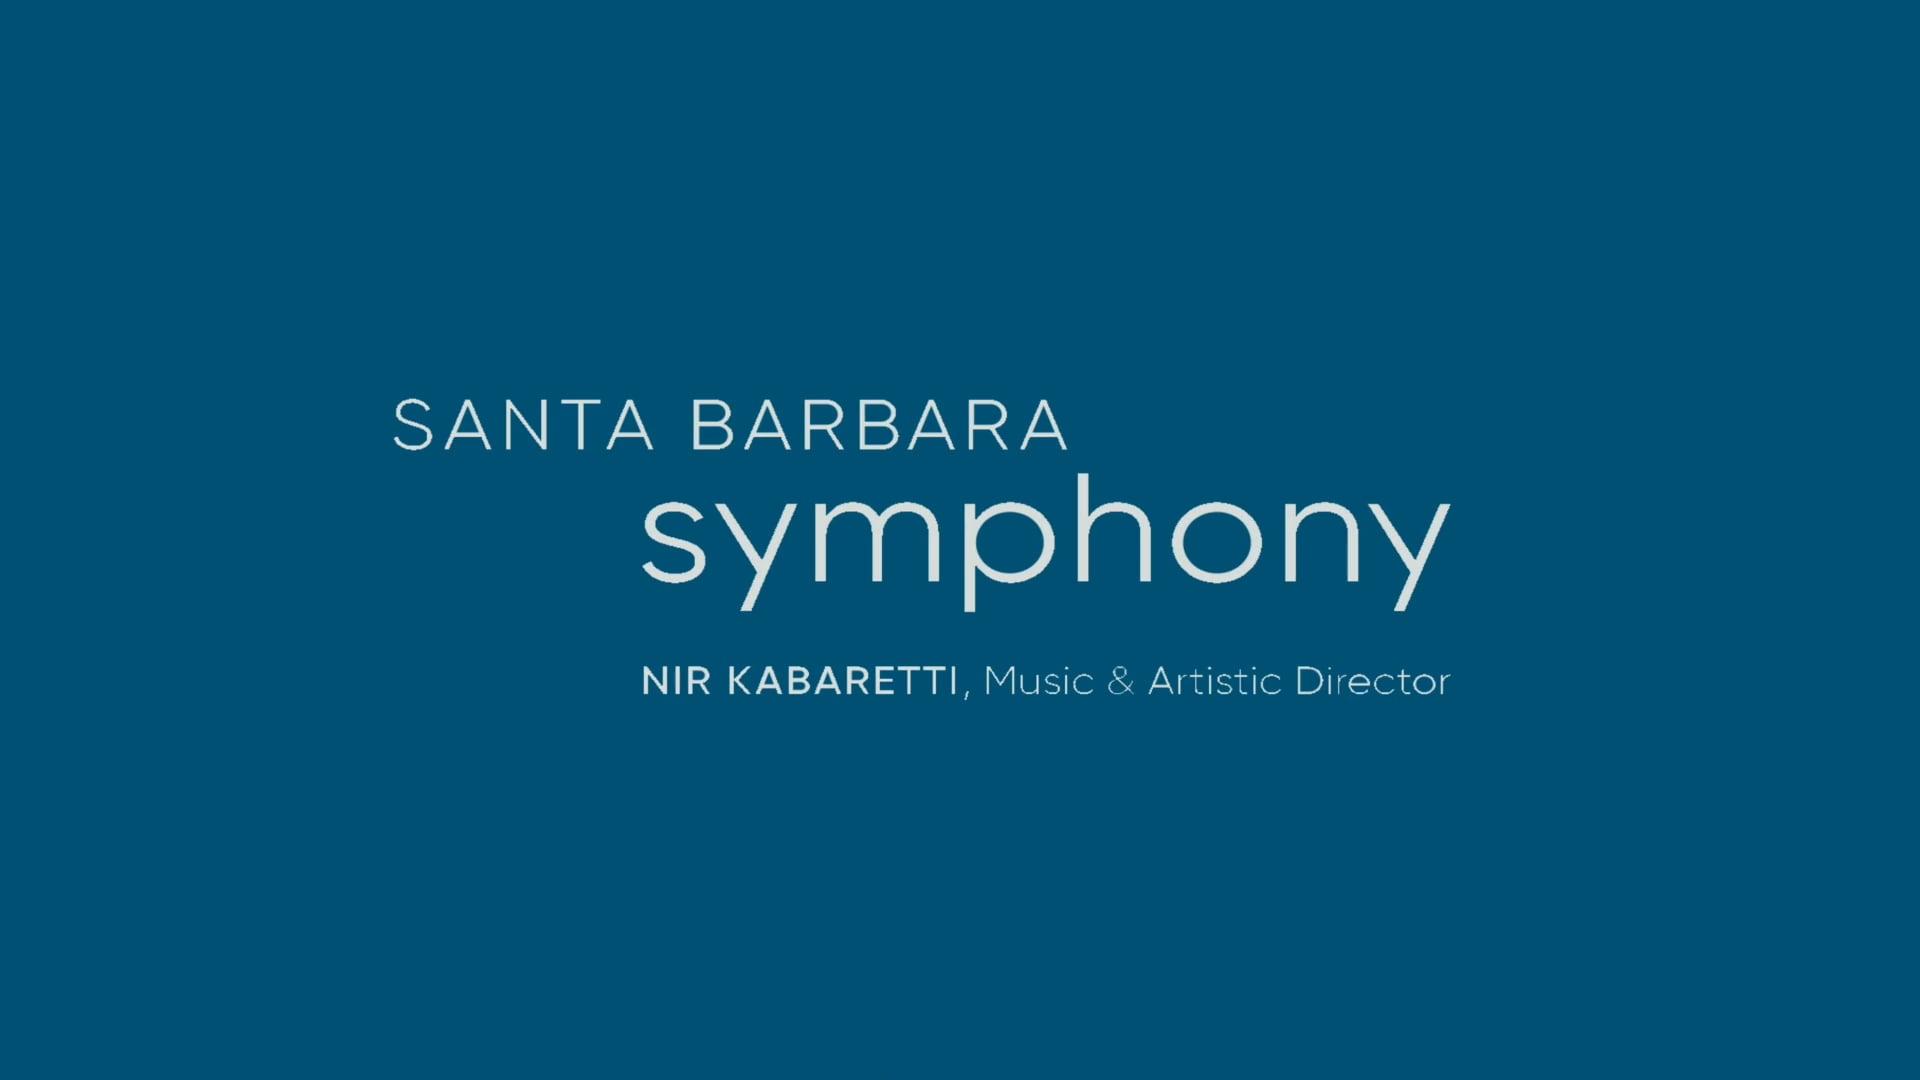 Sundays with the Symphony Stream 1 Teaser June 14